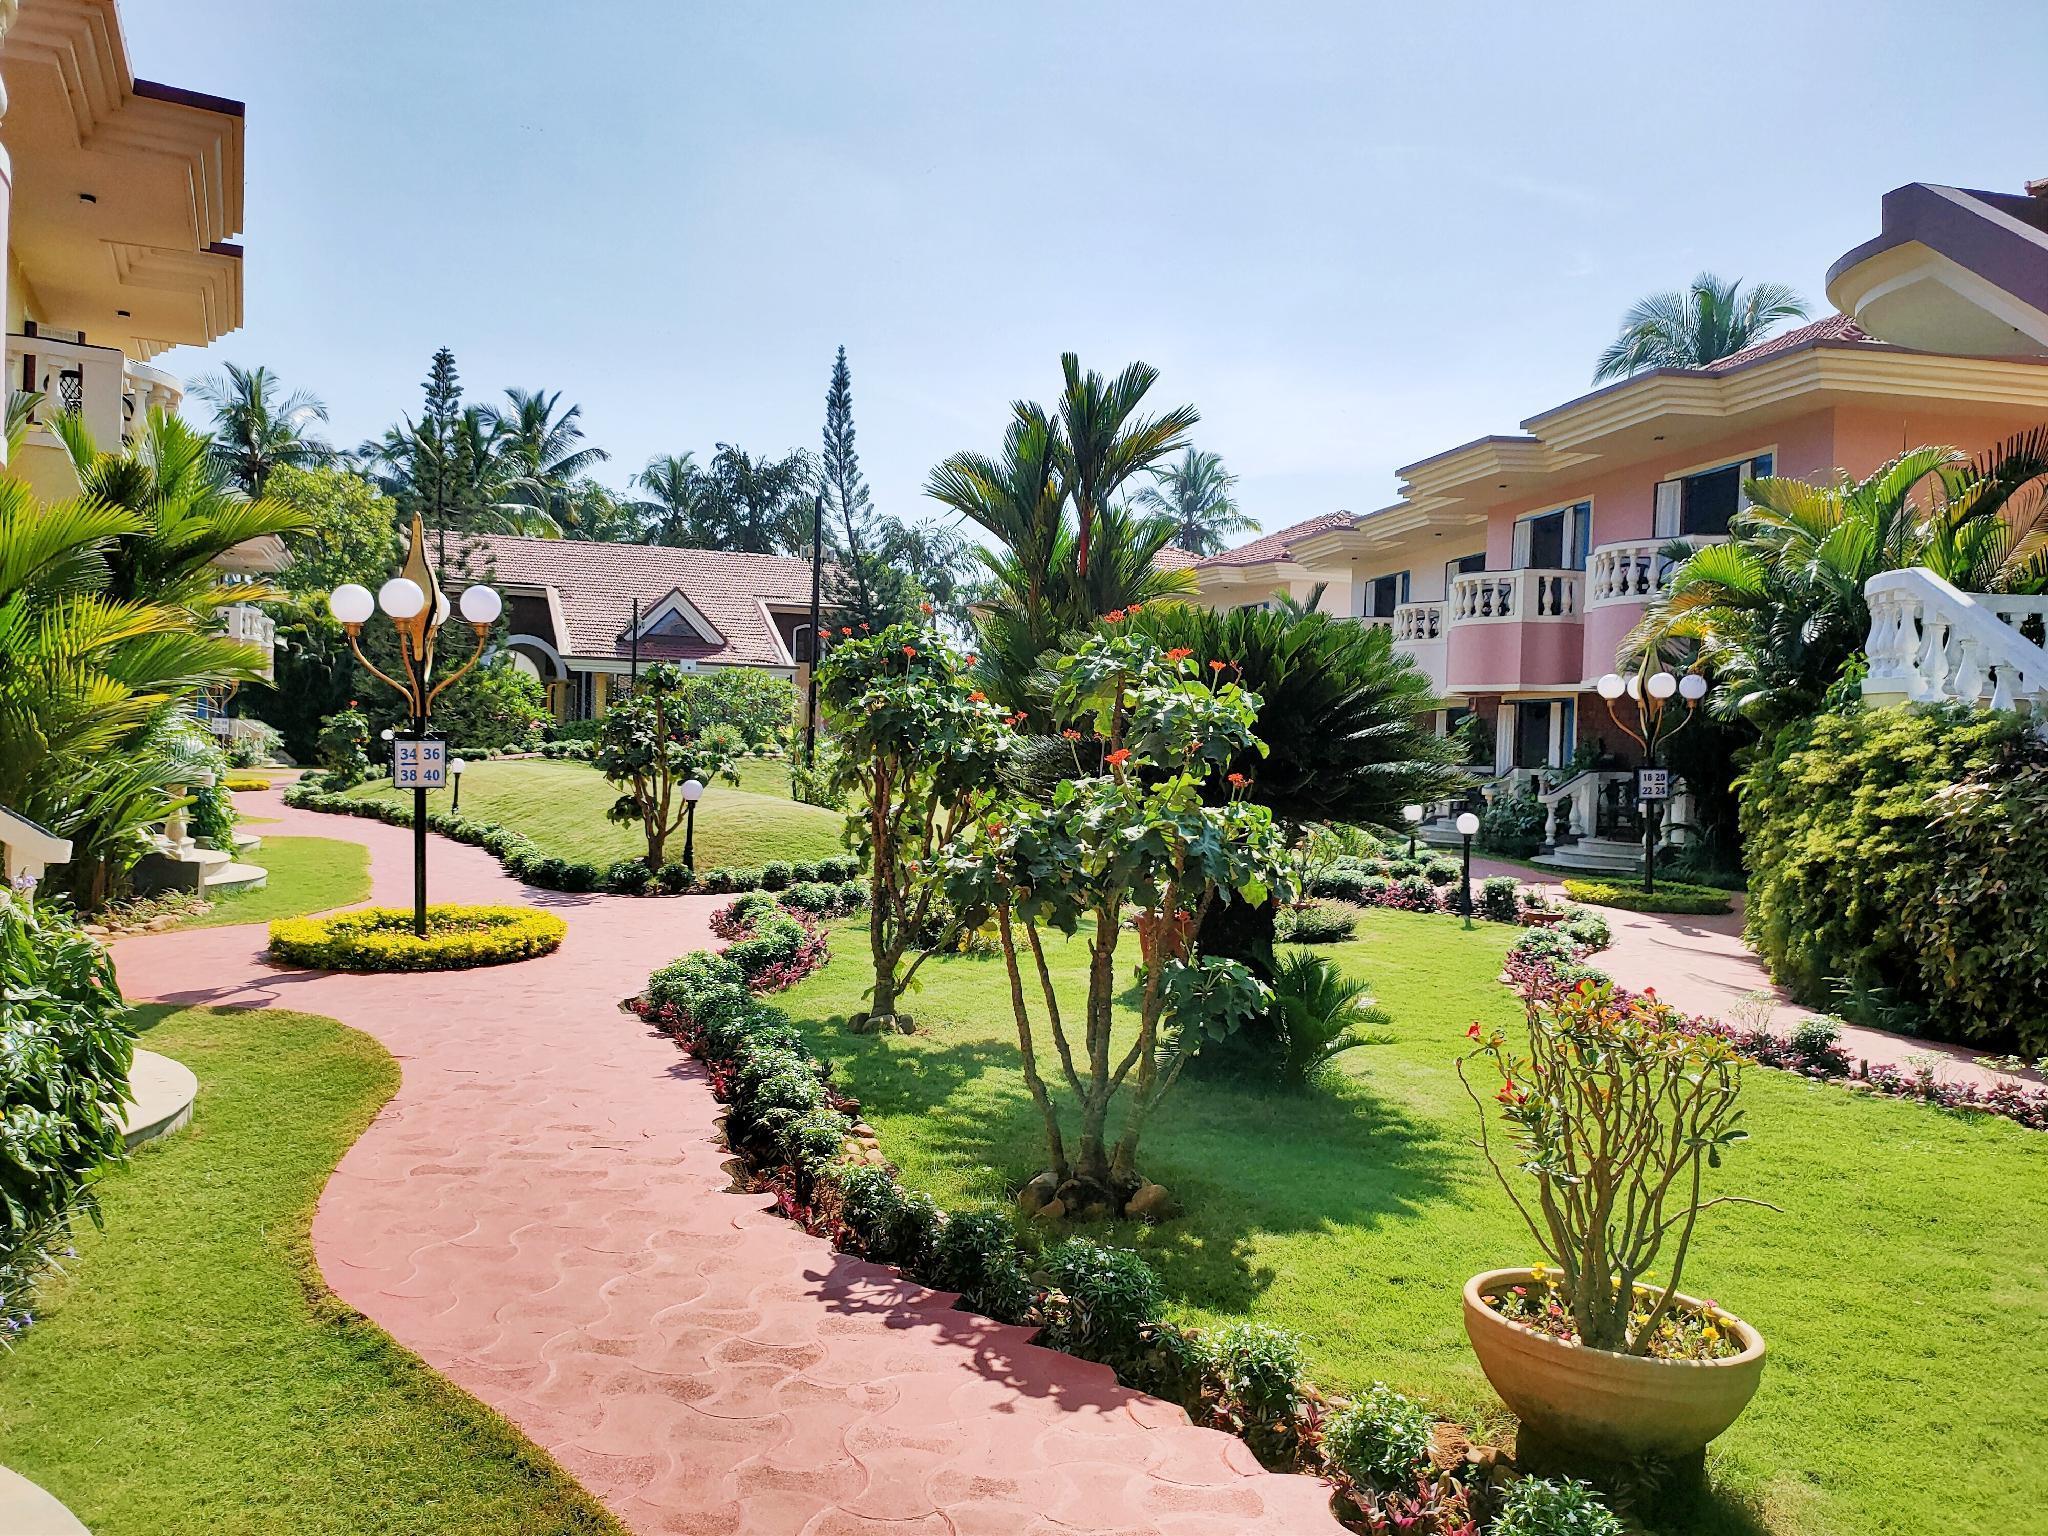 Indy Coconut Grove Beach Resort   A Beach Property